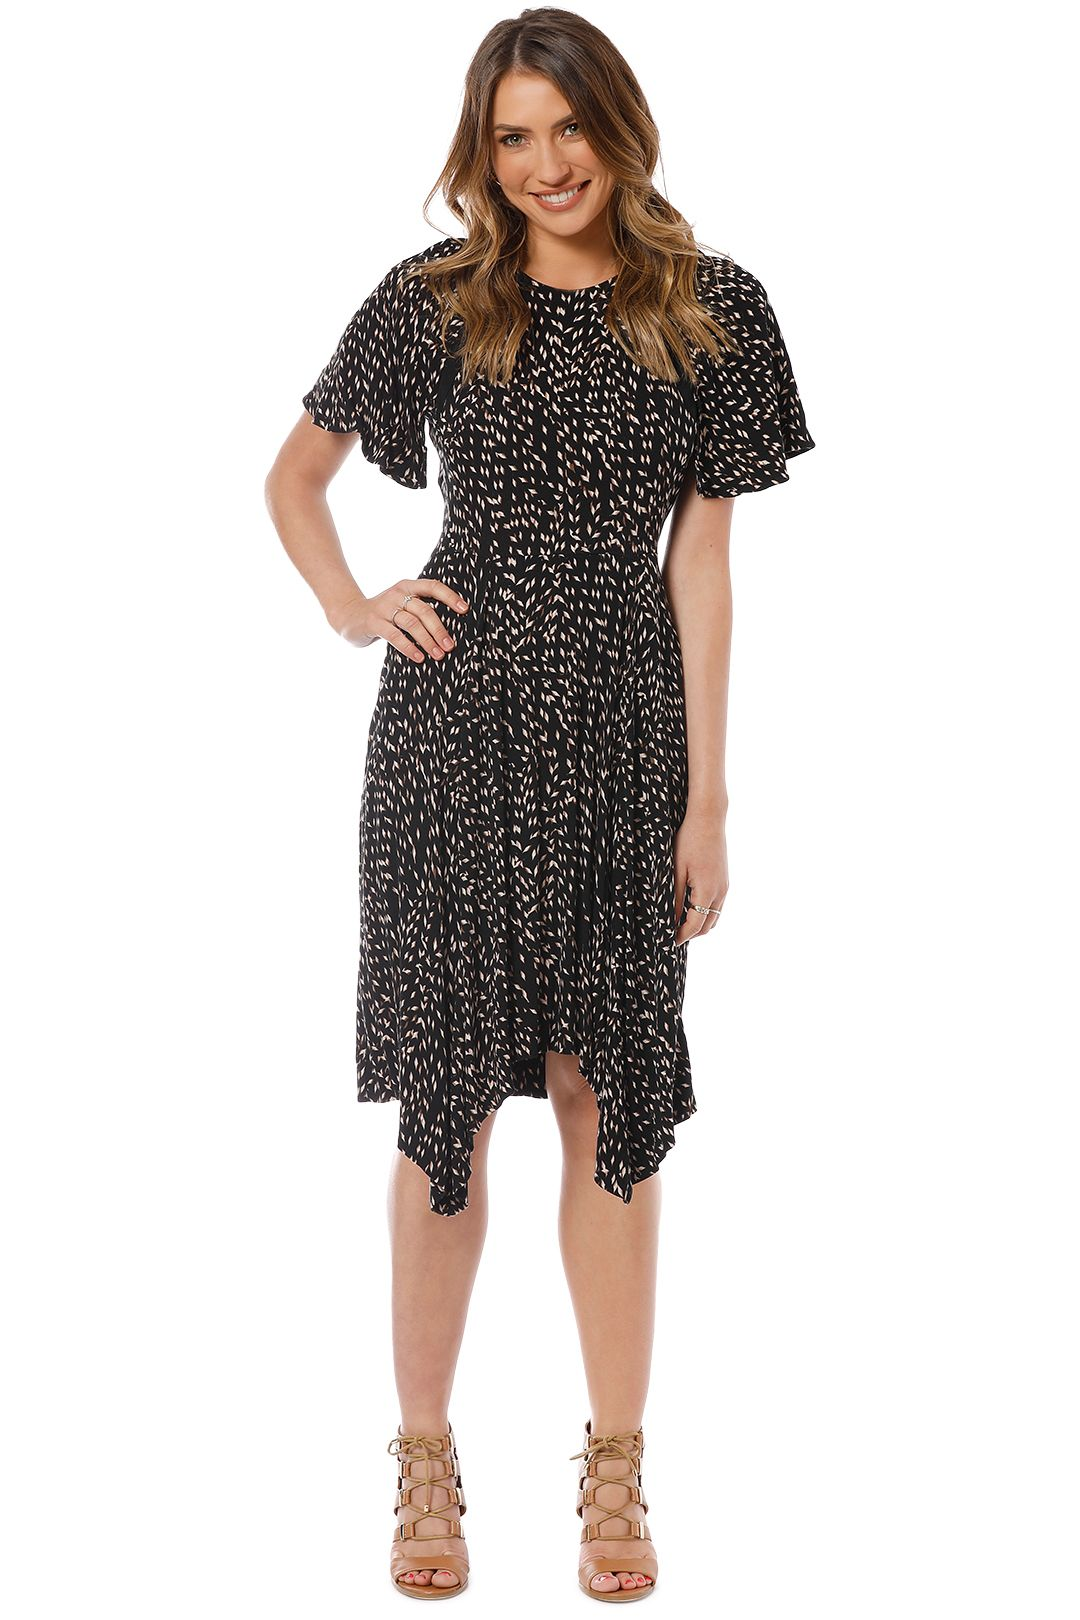 Saba - Basketweave Dress - Multi - Front